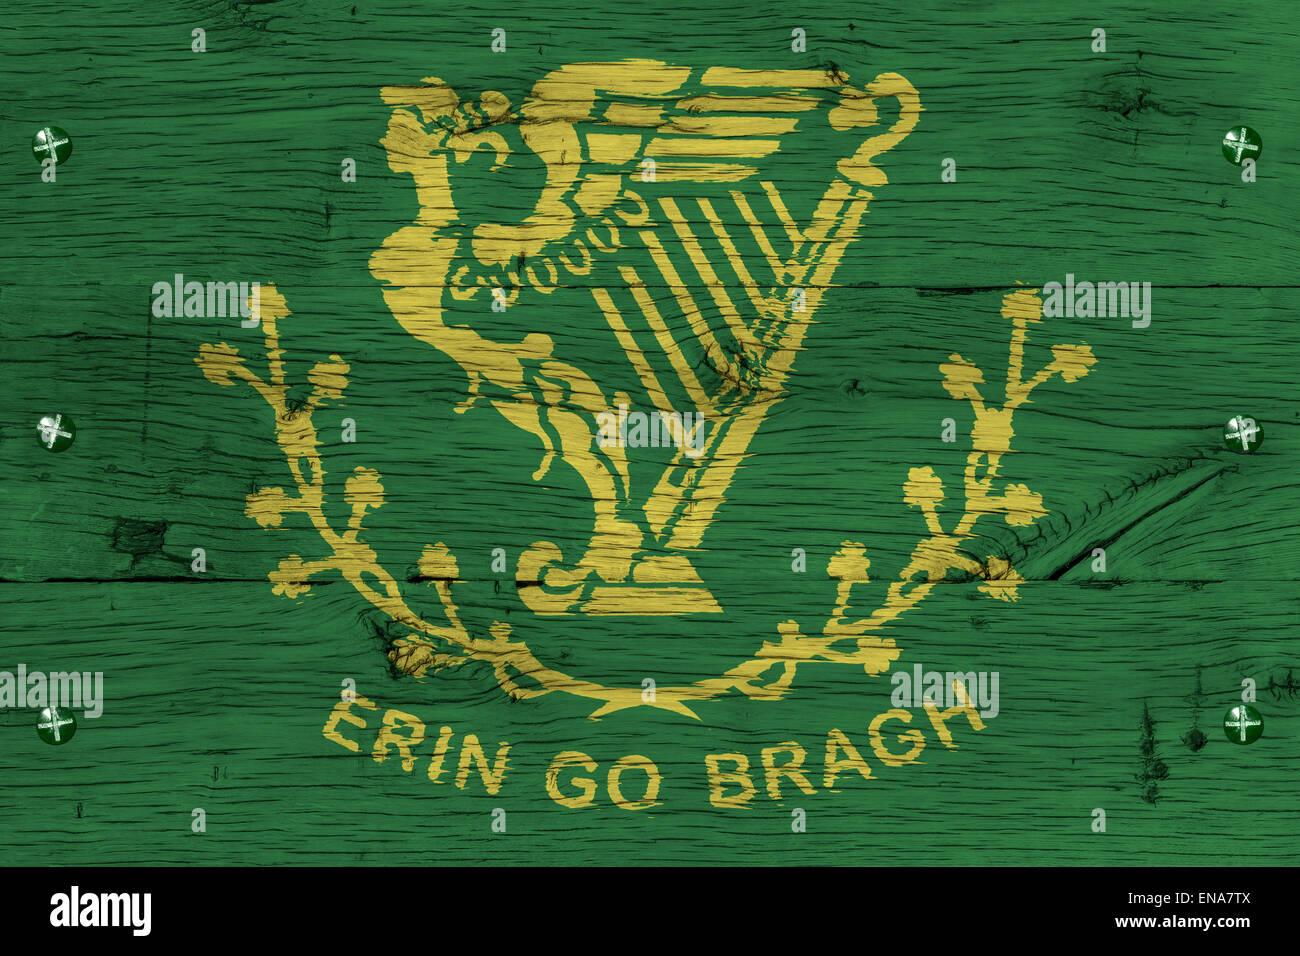 Erin go bragh irish ireland flag painting is colorful on wood of erin go bragh irish ireland flag painting is colorful on wood of old train carriage fastened by screws or bolts m4hsunfo